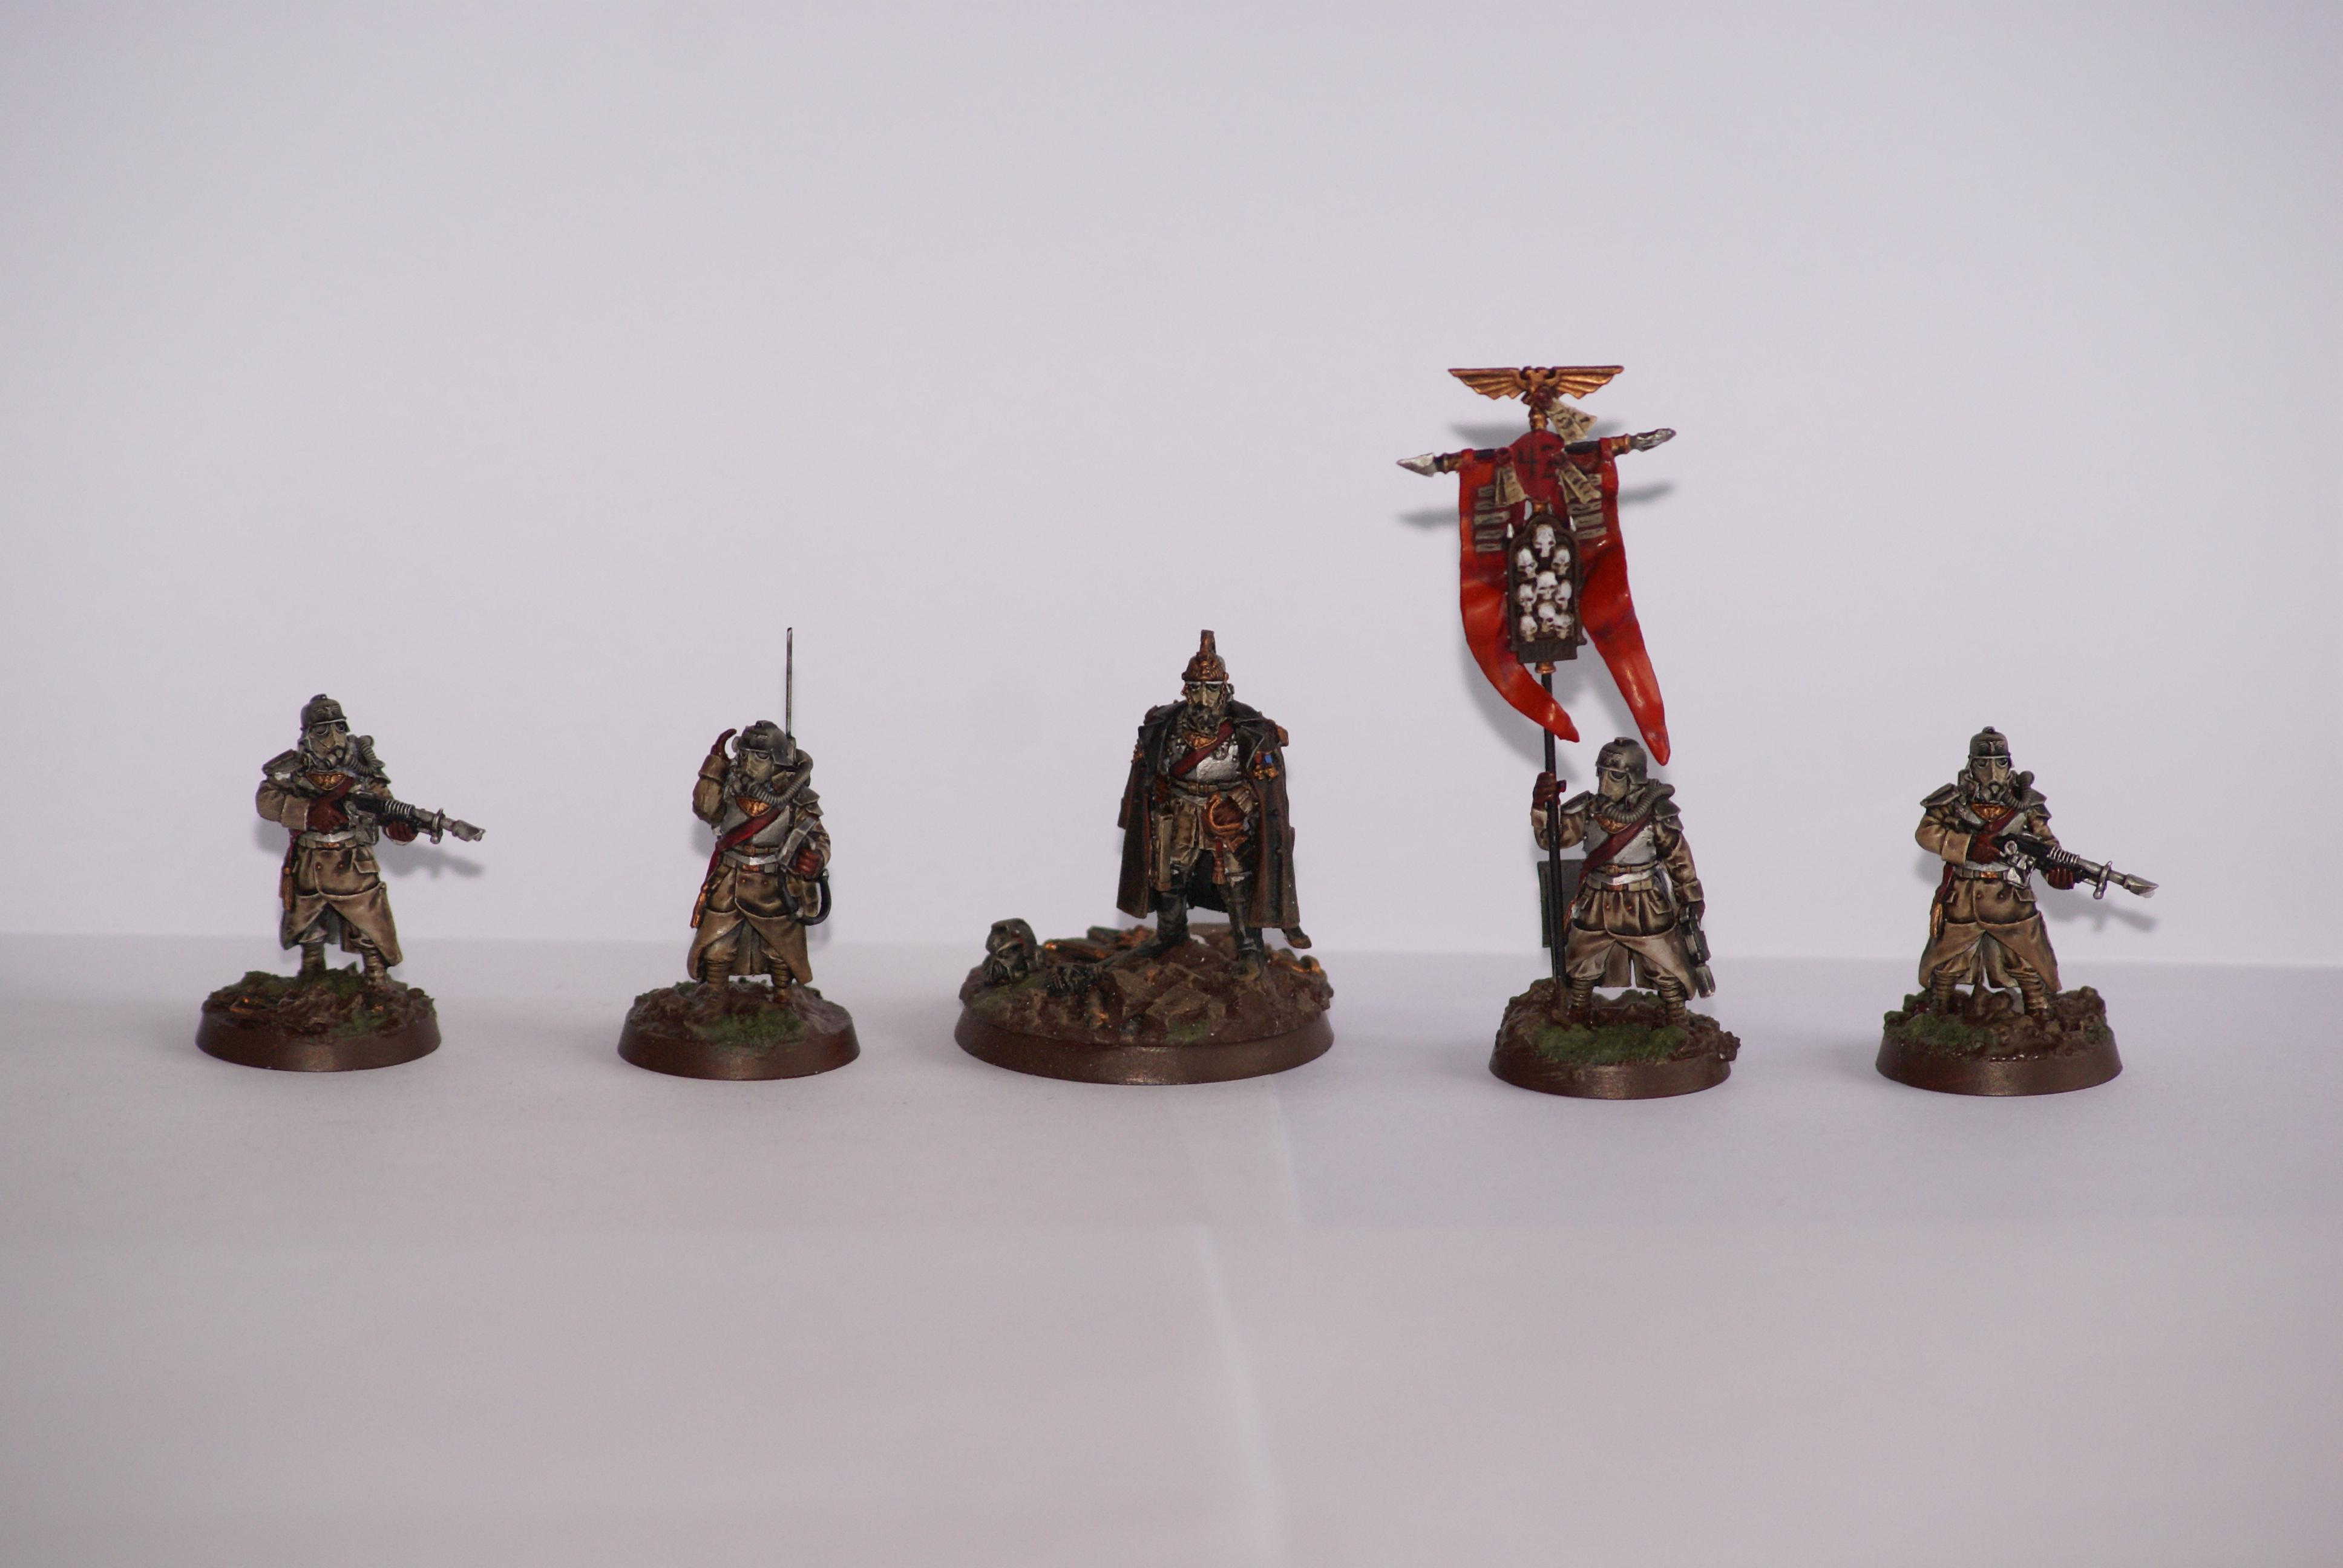 Death Korps of Krieg, Deathkorps, Imperial Guard, Warhammer 40,000, Wash